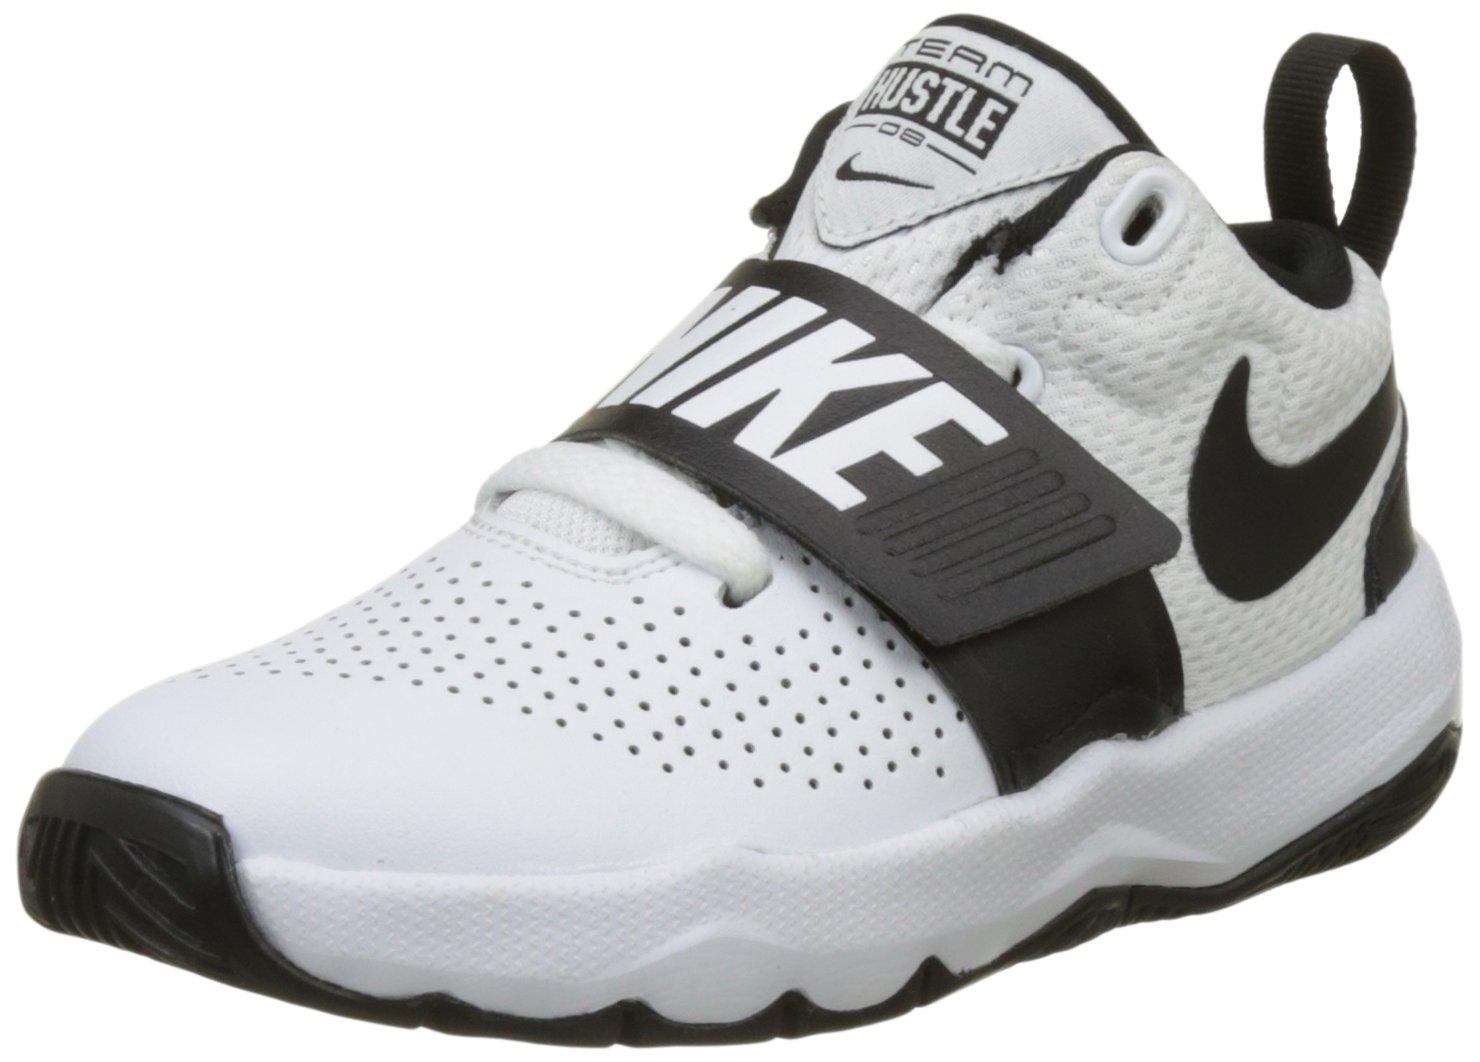 timeless design a65b9 61668 Nike Team Hustle D 8, Scarpe da Basket Bambino product image